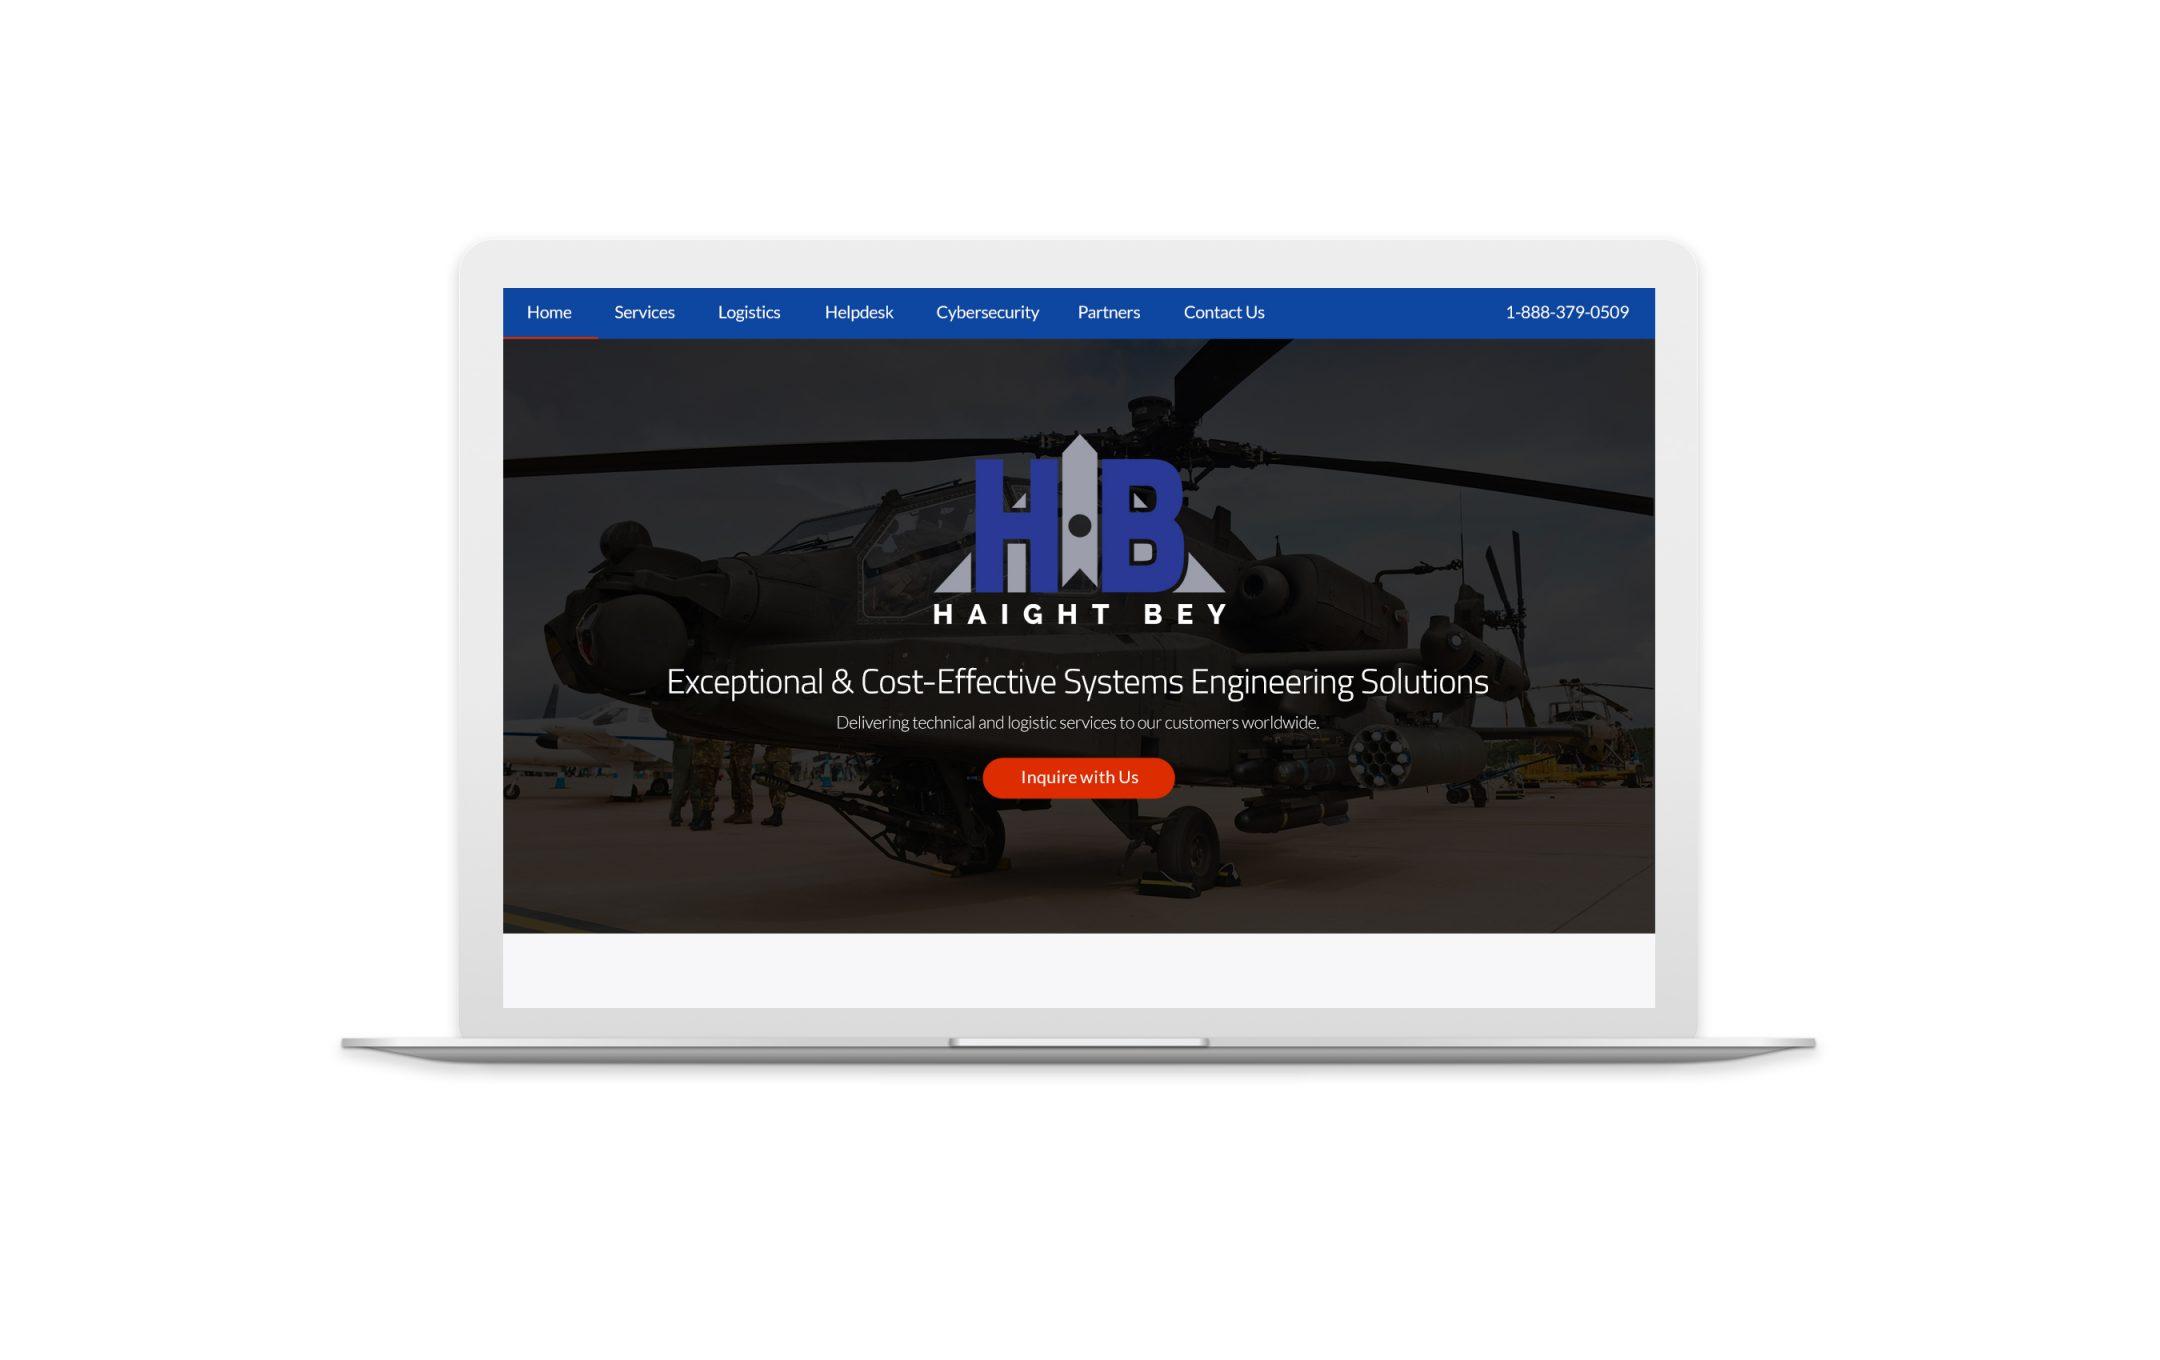 haightbey.com website mock-up